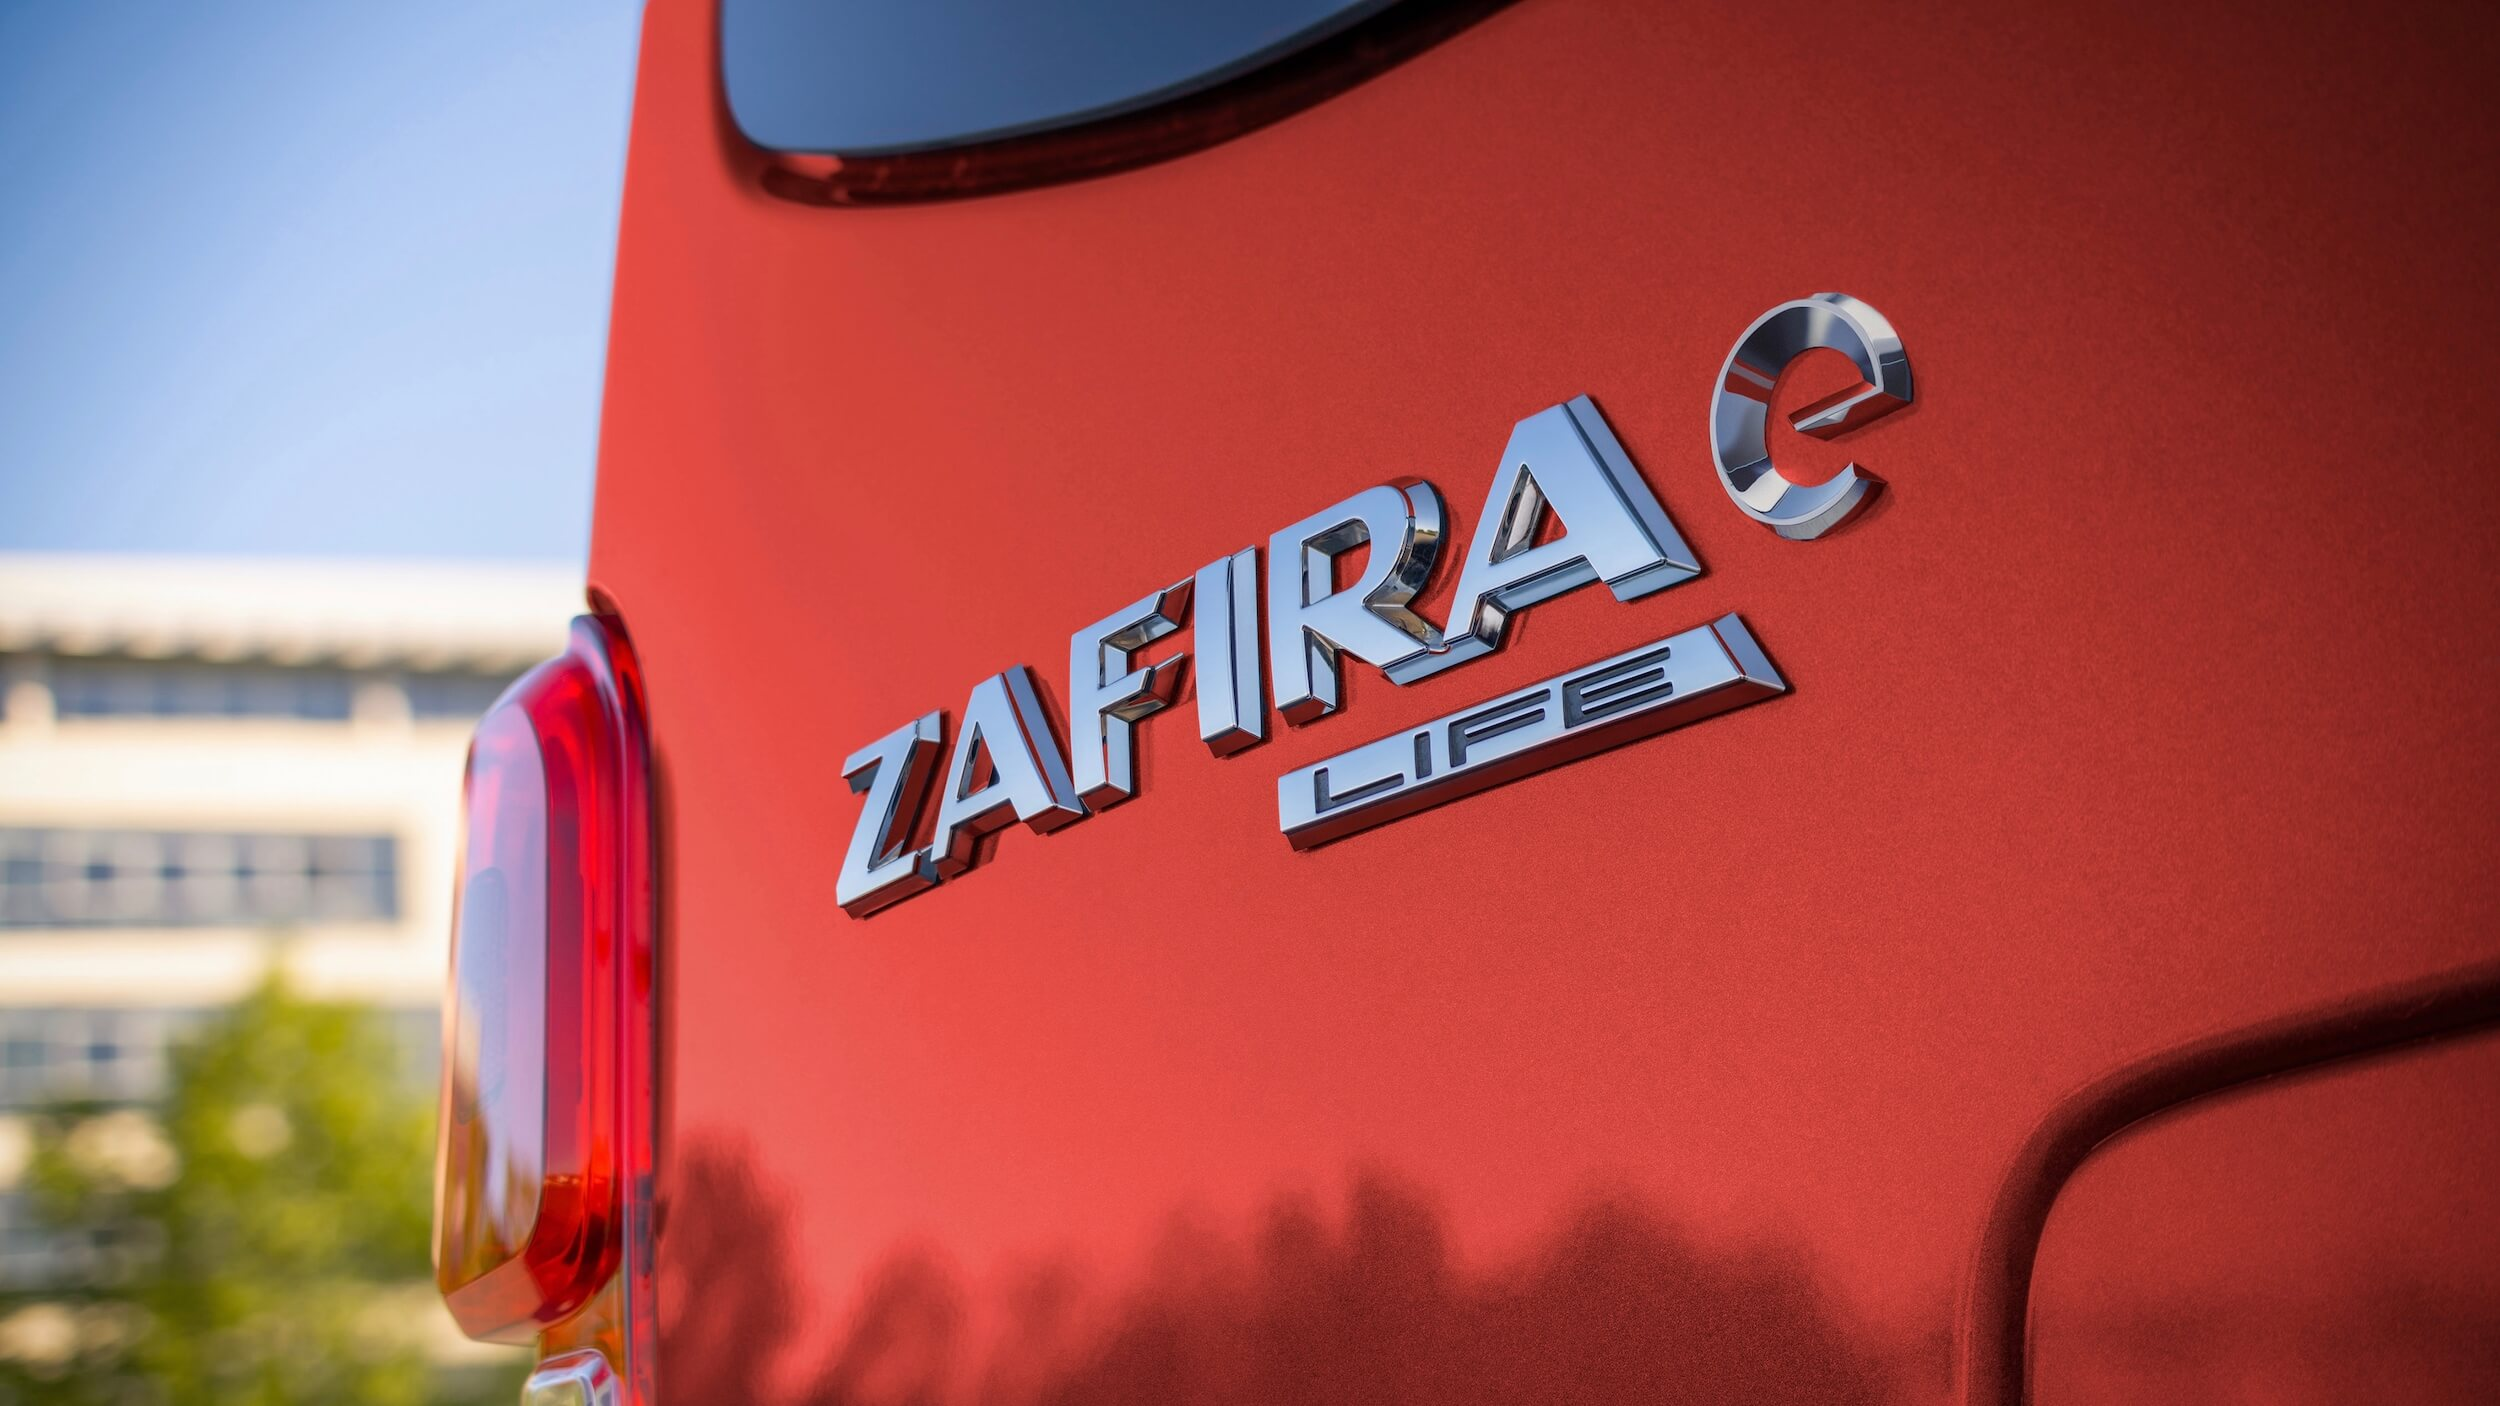 Elektrische Opel Zafira badge